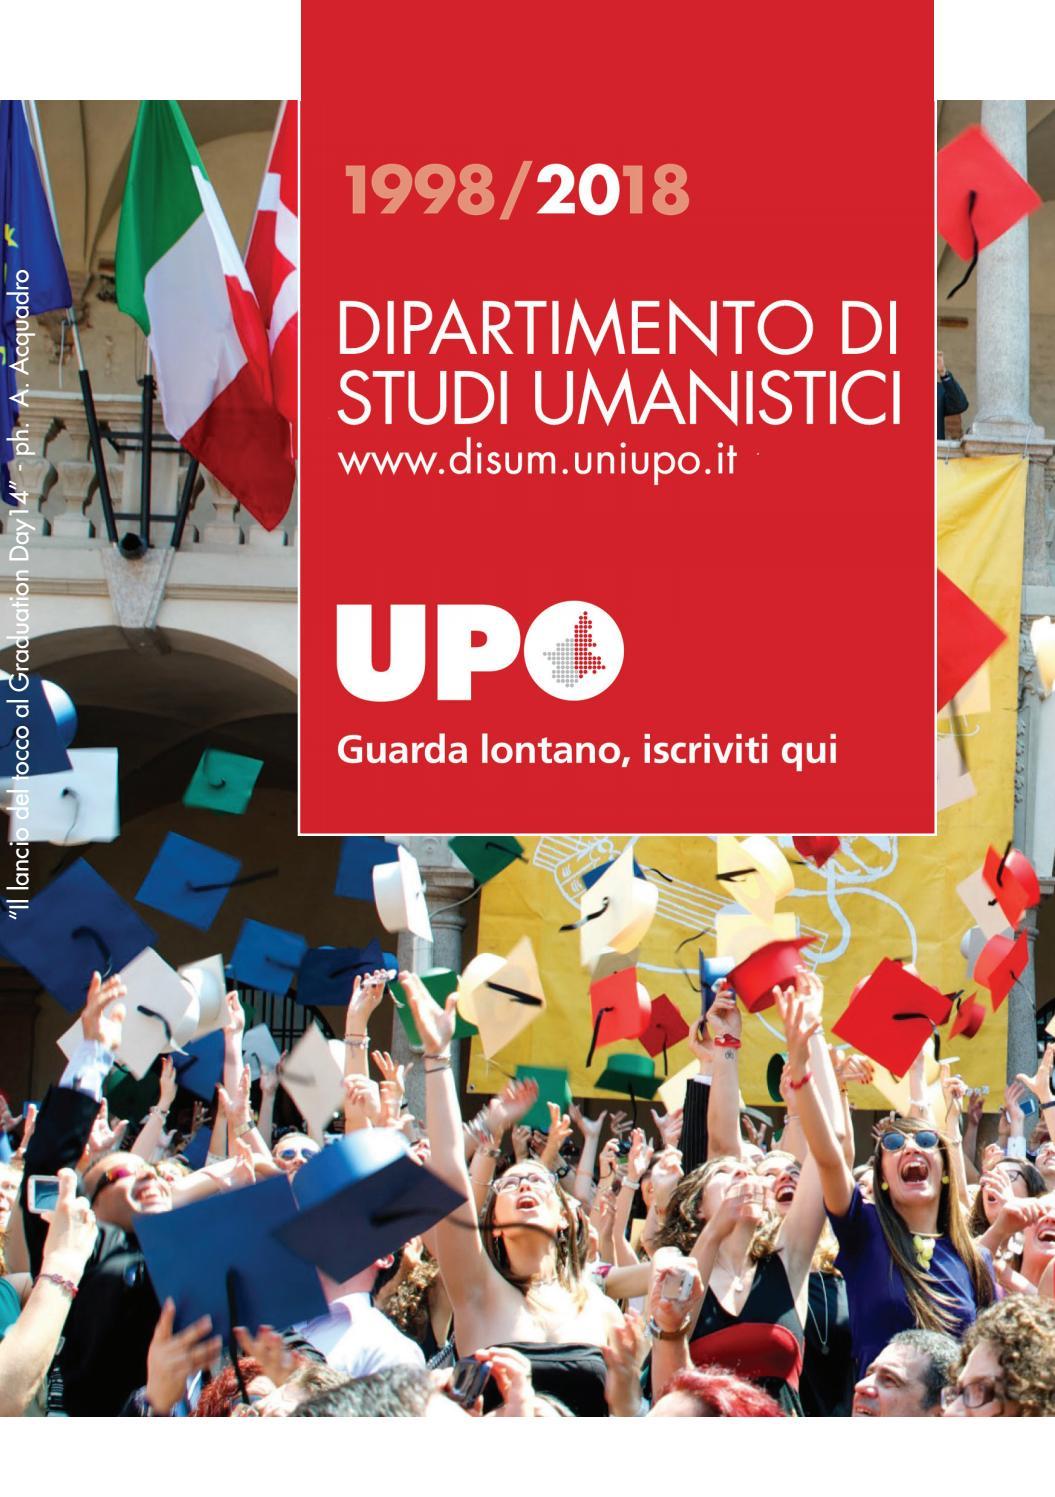 Disum Calendario Esami.Guida Studenti Dipartimento Di Studi Umanistici By